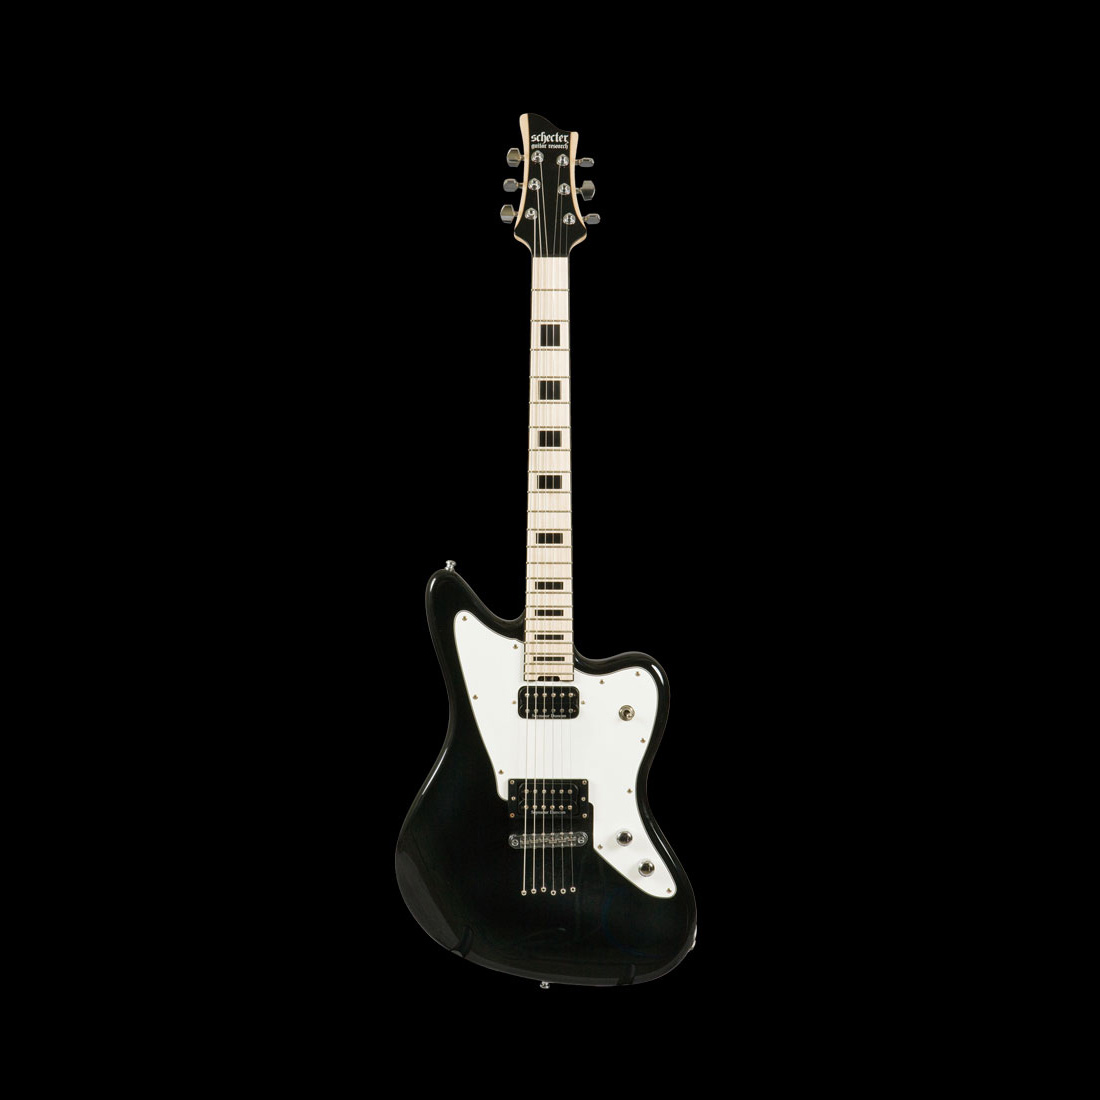 Schecter / AC-FC-KA/SIG Black シェクター エレキギター KAZUKIシグネイチャー 《受注生産:予約受付中》